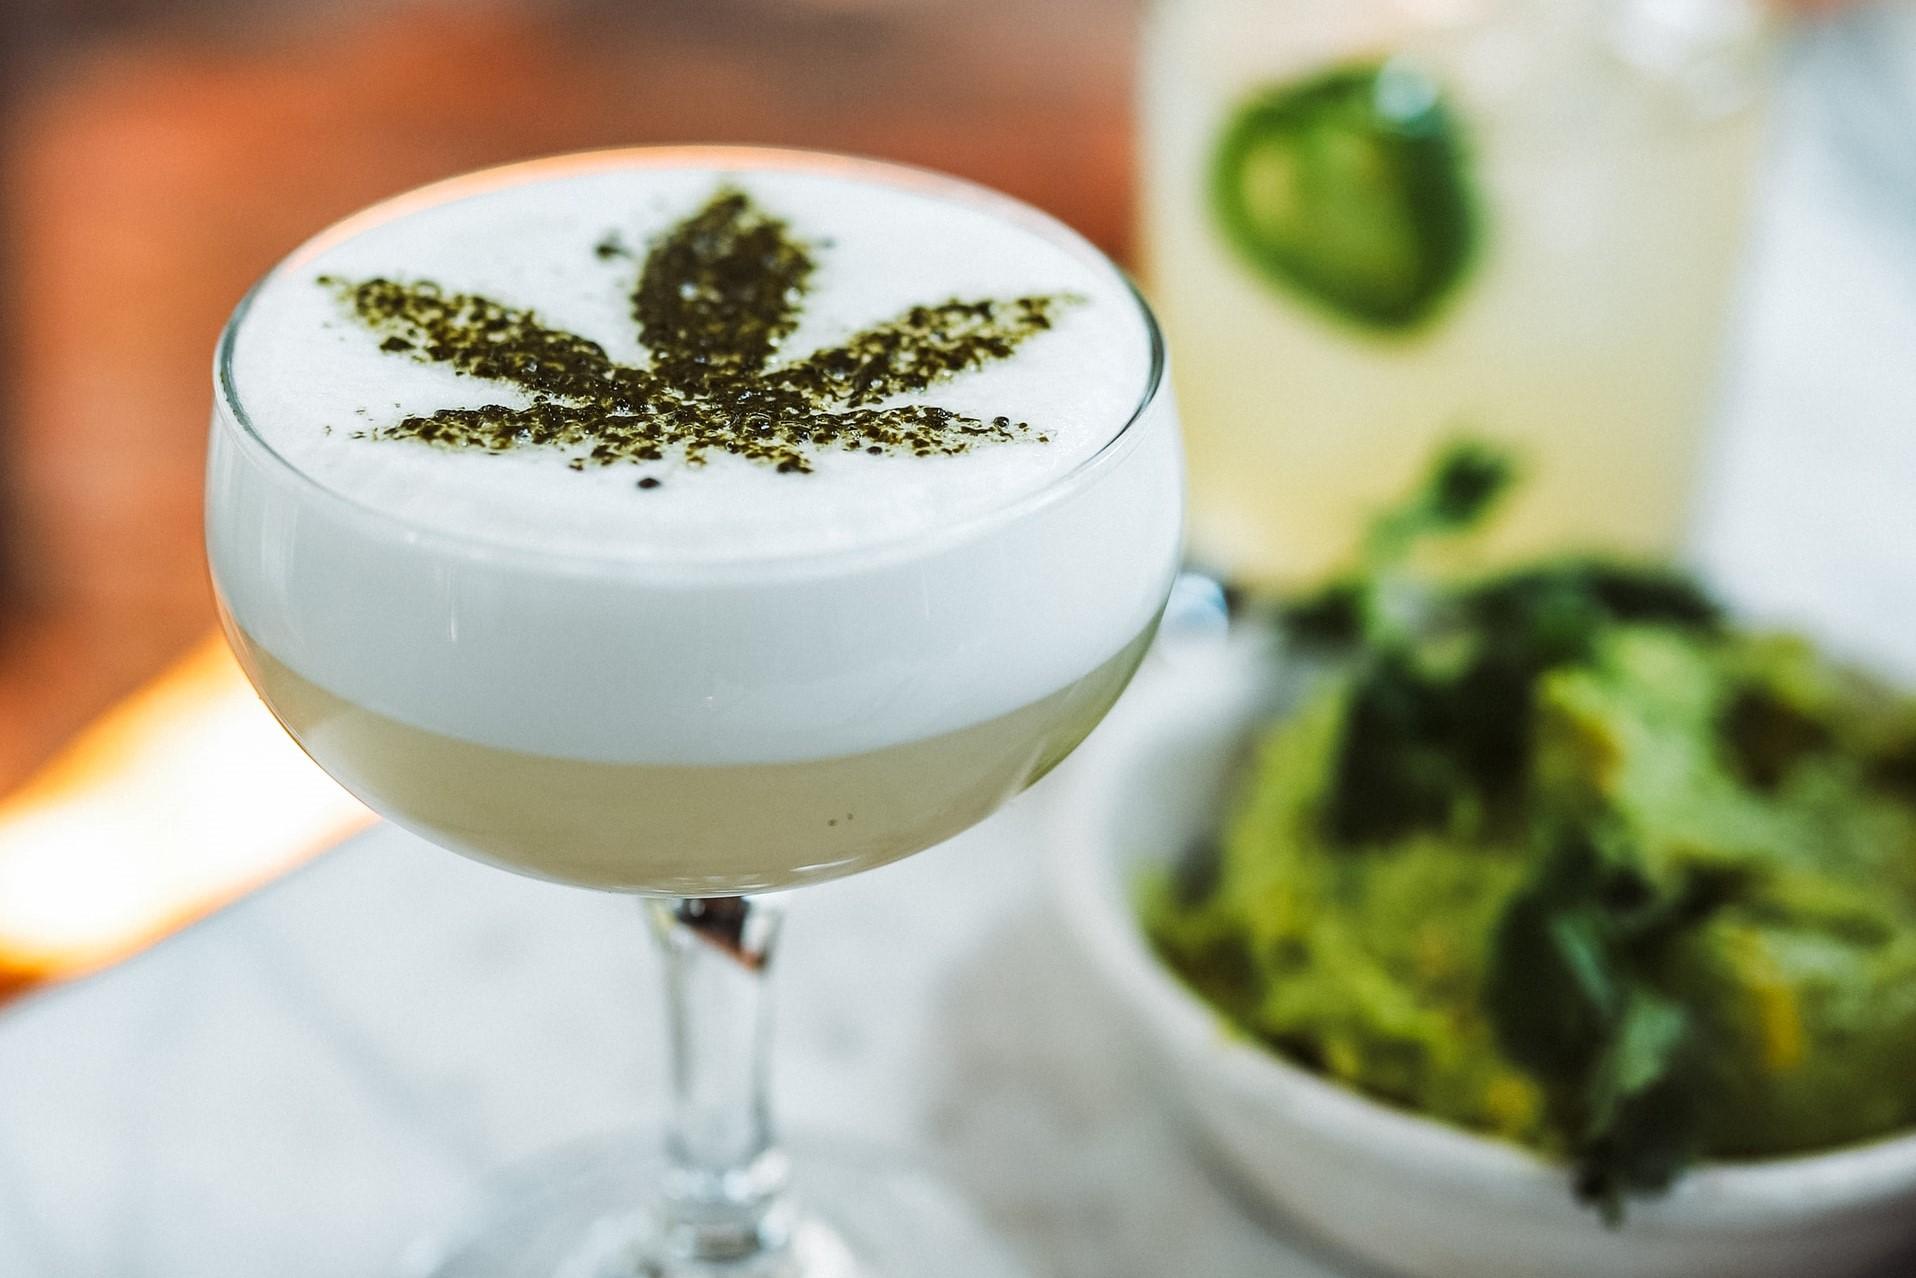 marijuana cocktail in glass